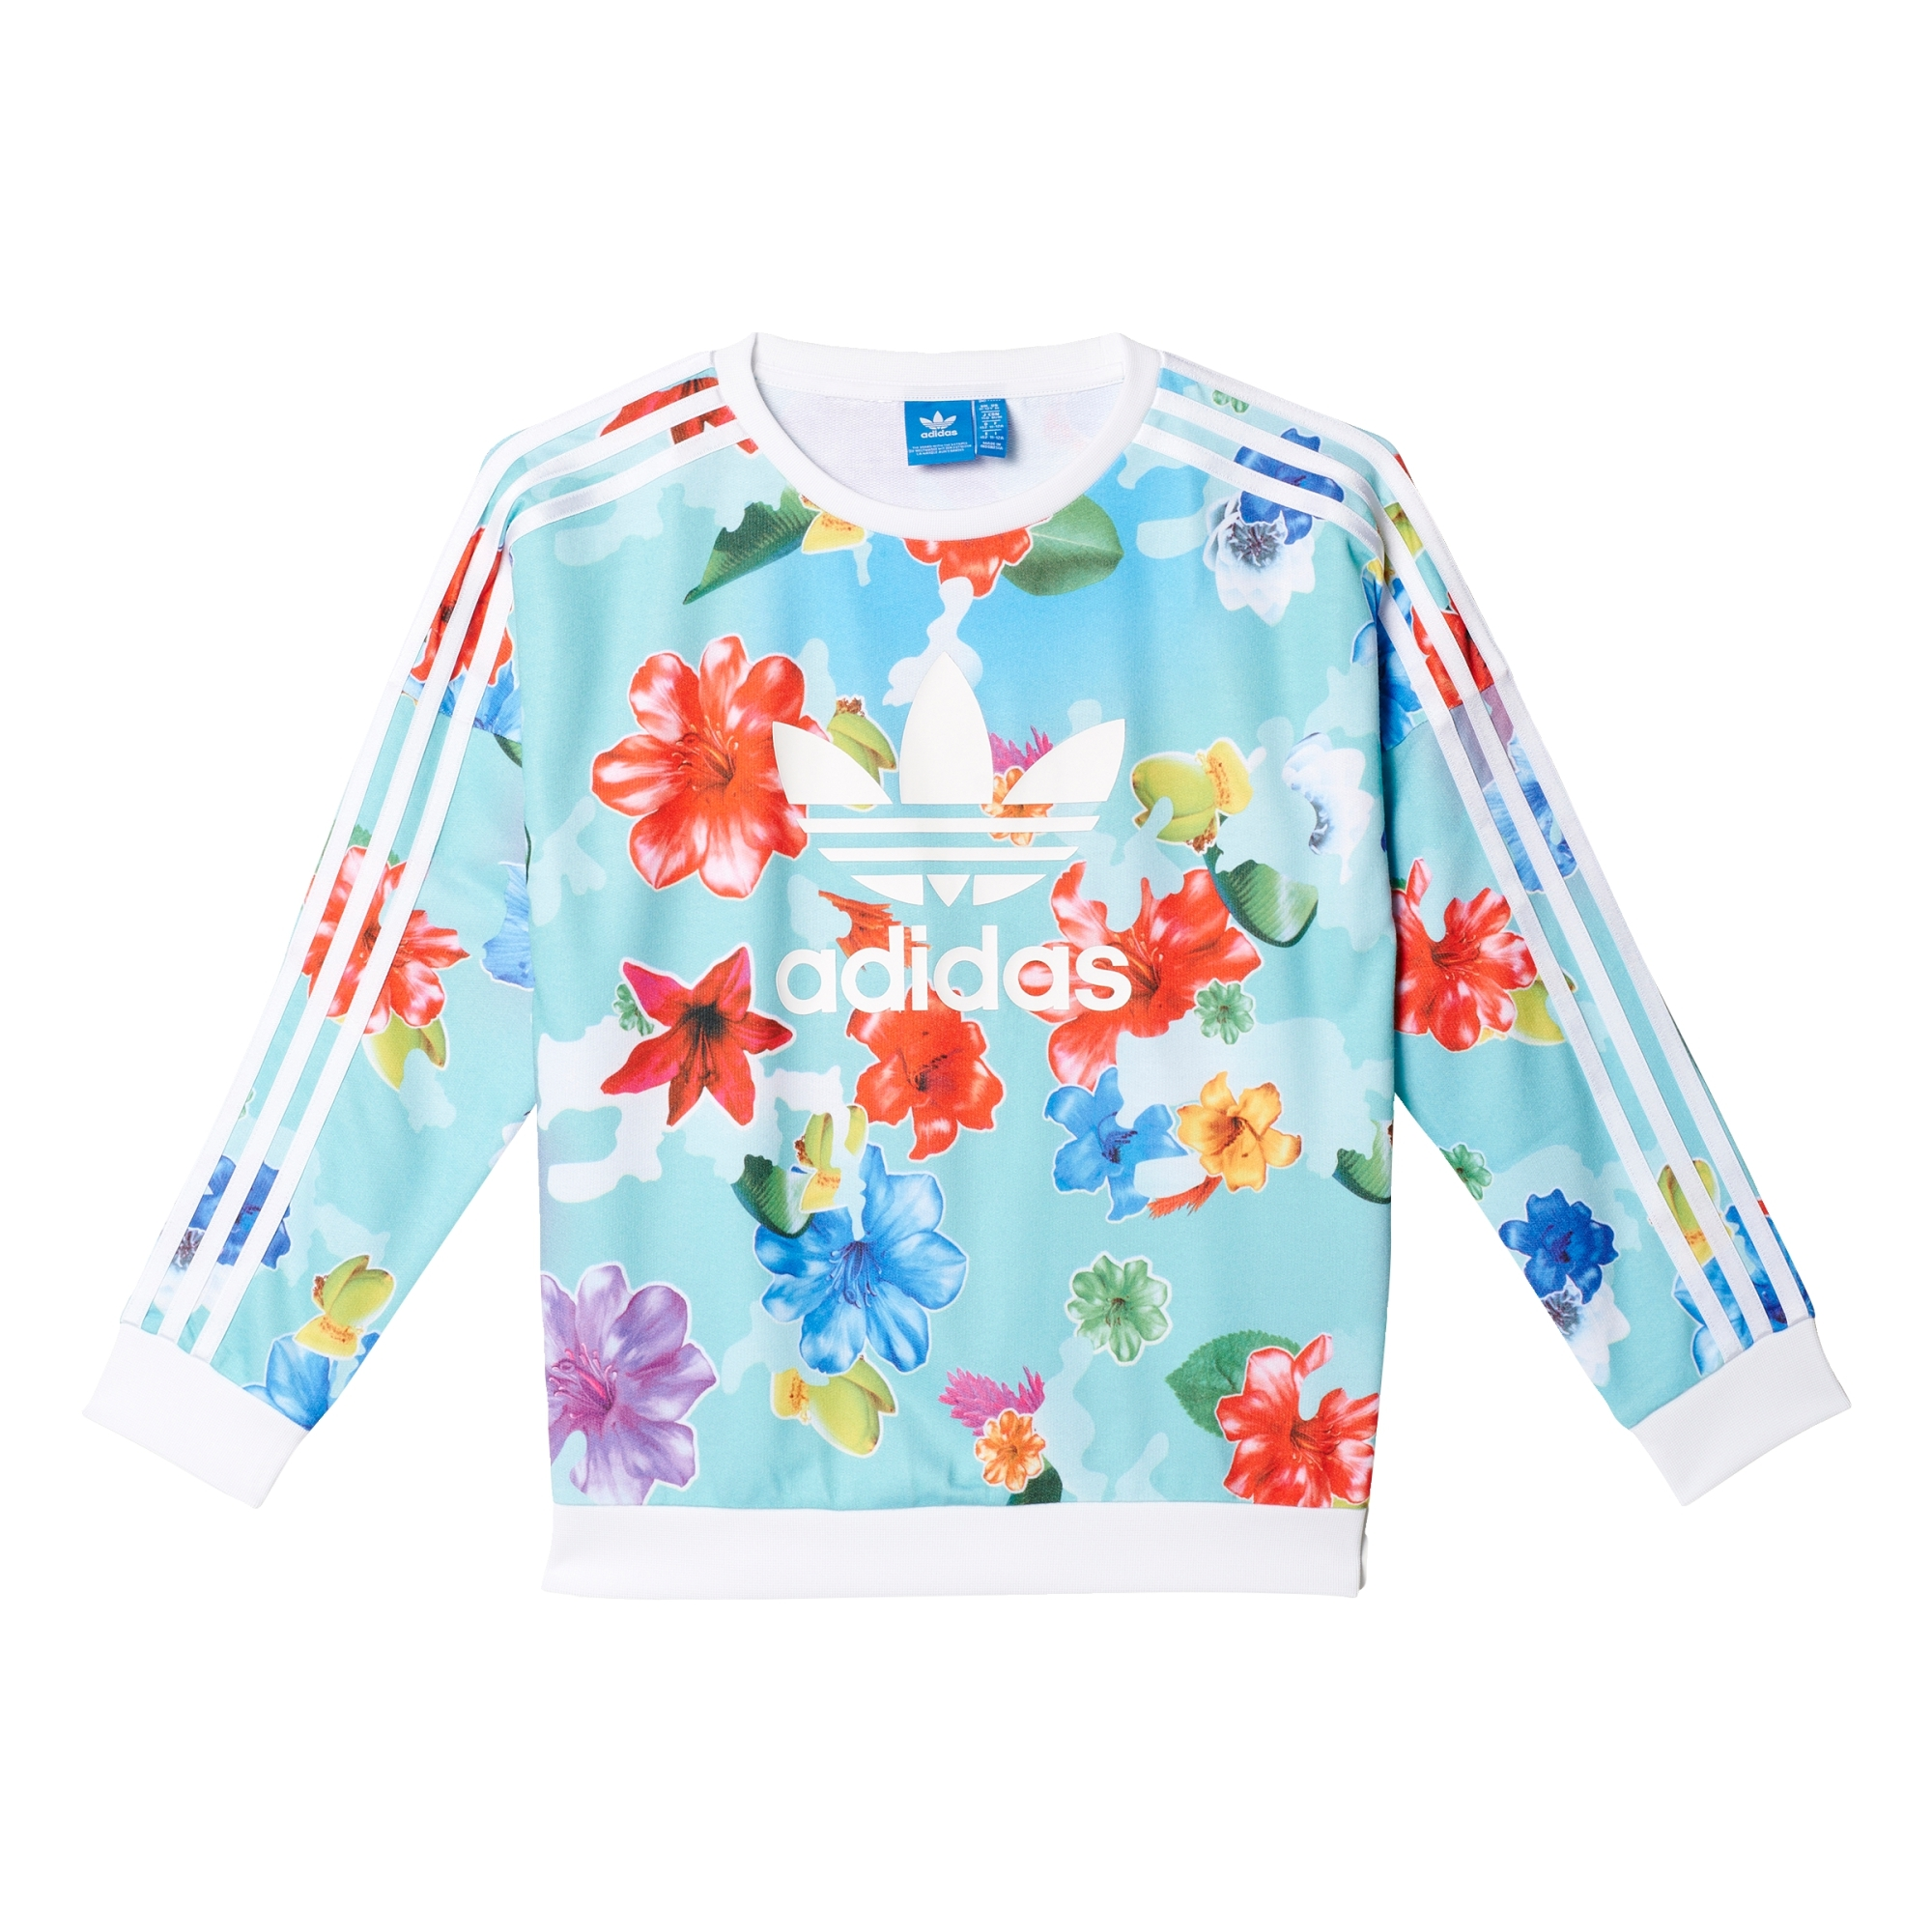 best loved 4fdd1 e295a Adidas Originals Trefoil Flower Crew AOP J (multicolor white)